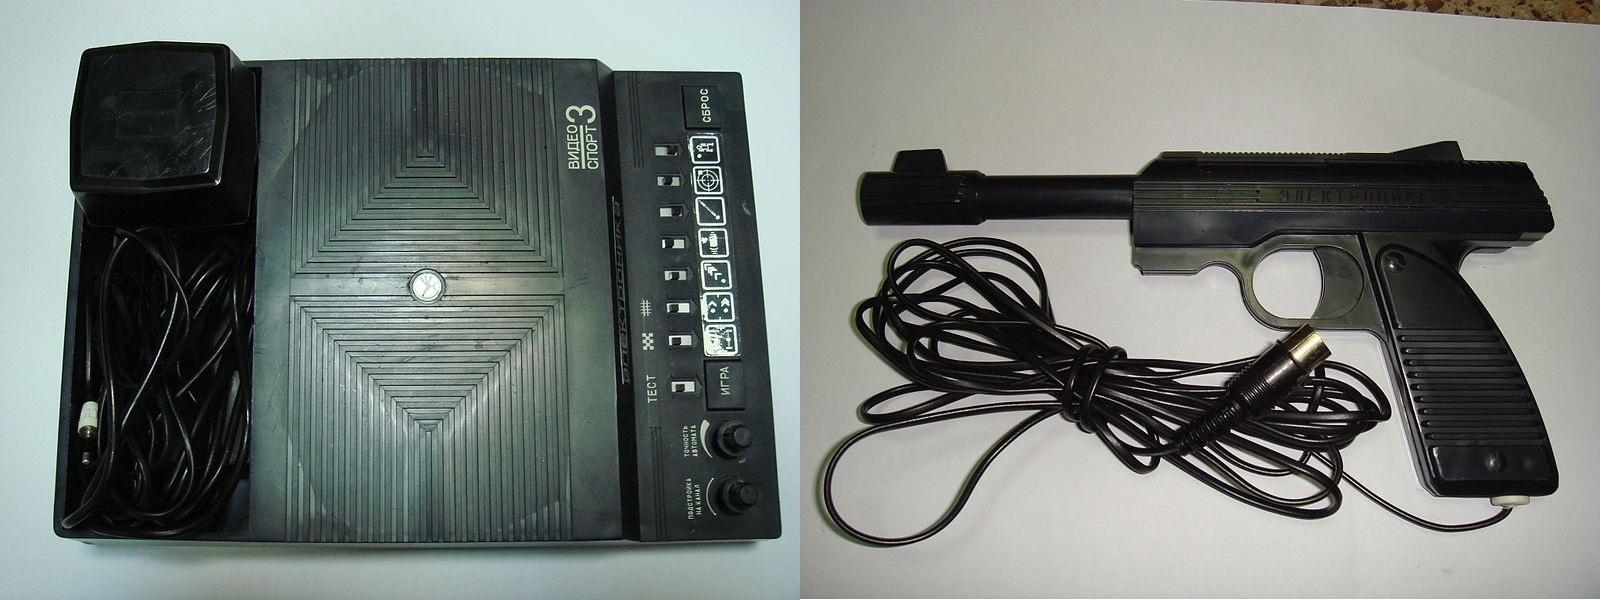 800px-Elektronika-VideoSport3-7